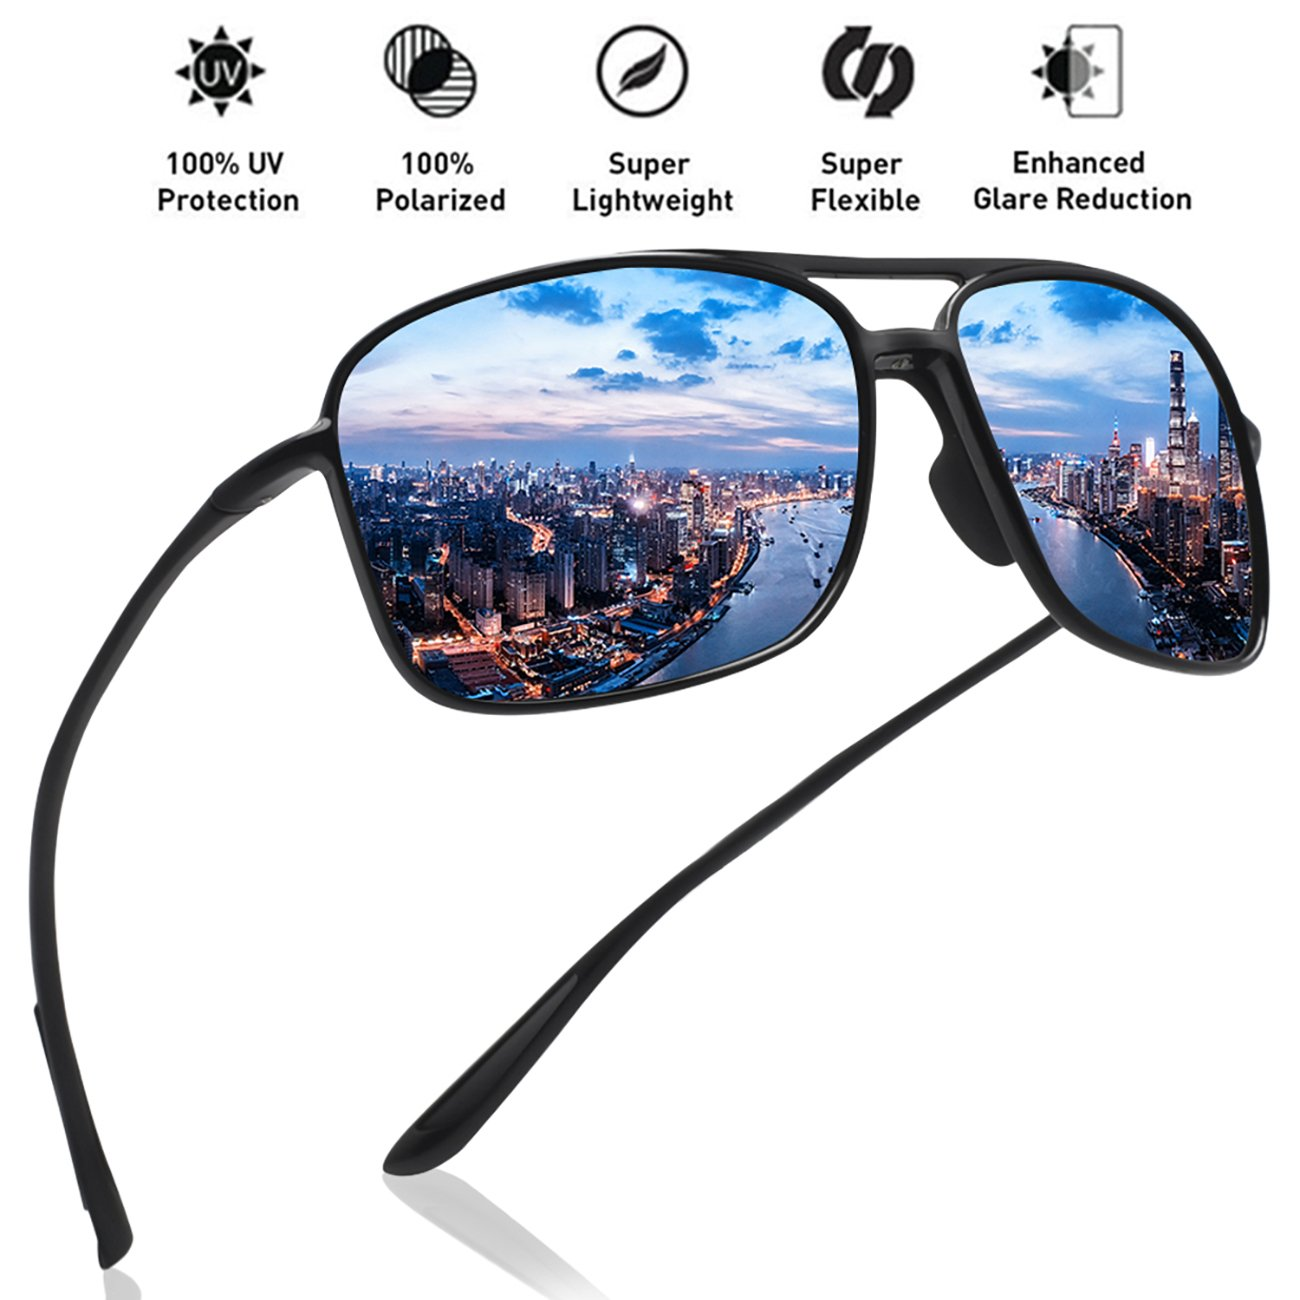 01951713c93 Amazon.com  JULI Polarized Pilot Sports Sunglasses for Men Women Tr90  Unbreakable Frame for Running Fishing Baseball Driving  Clothing